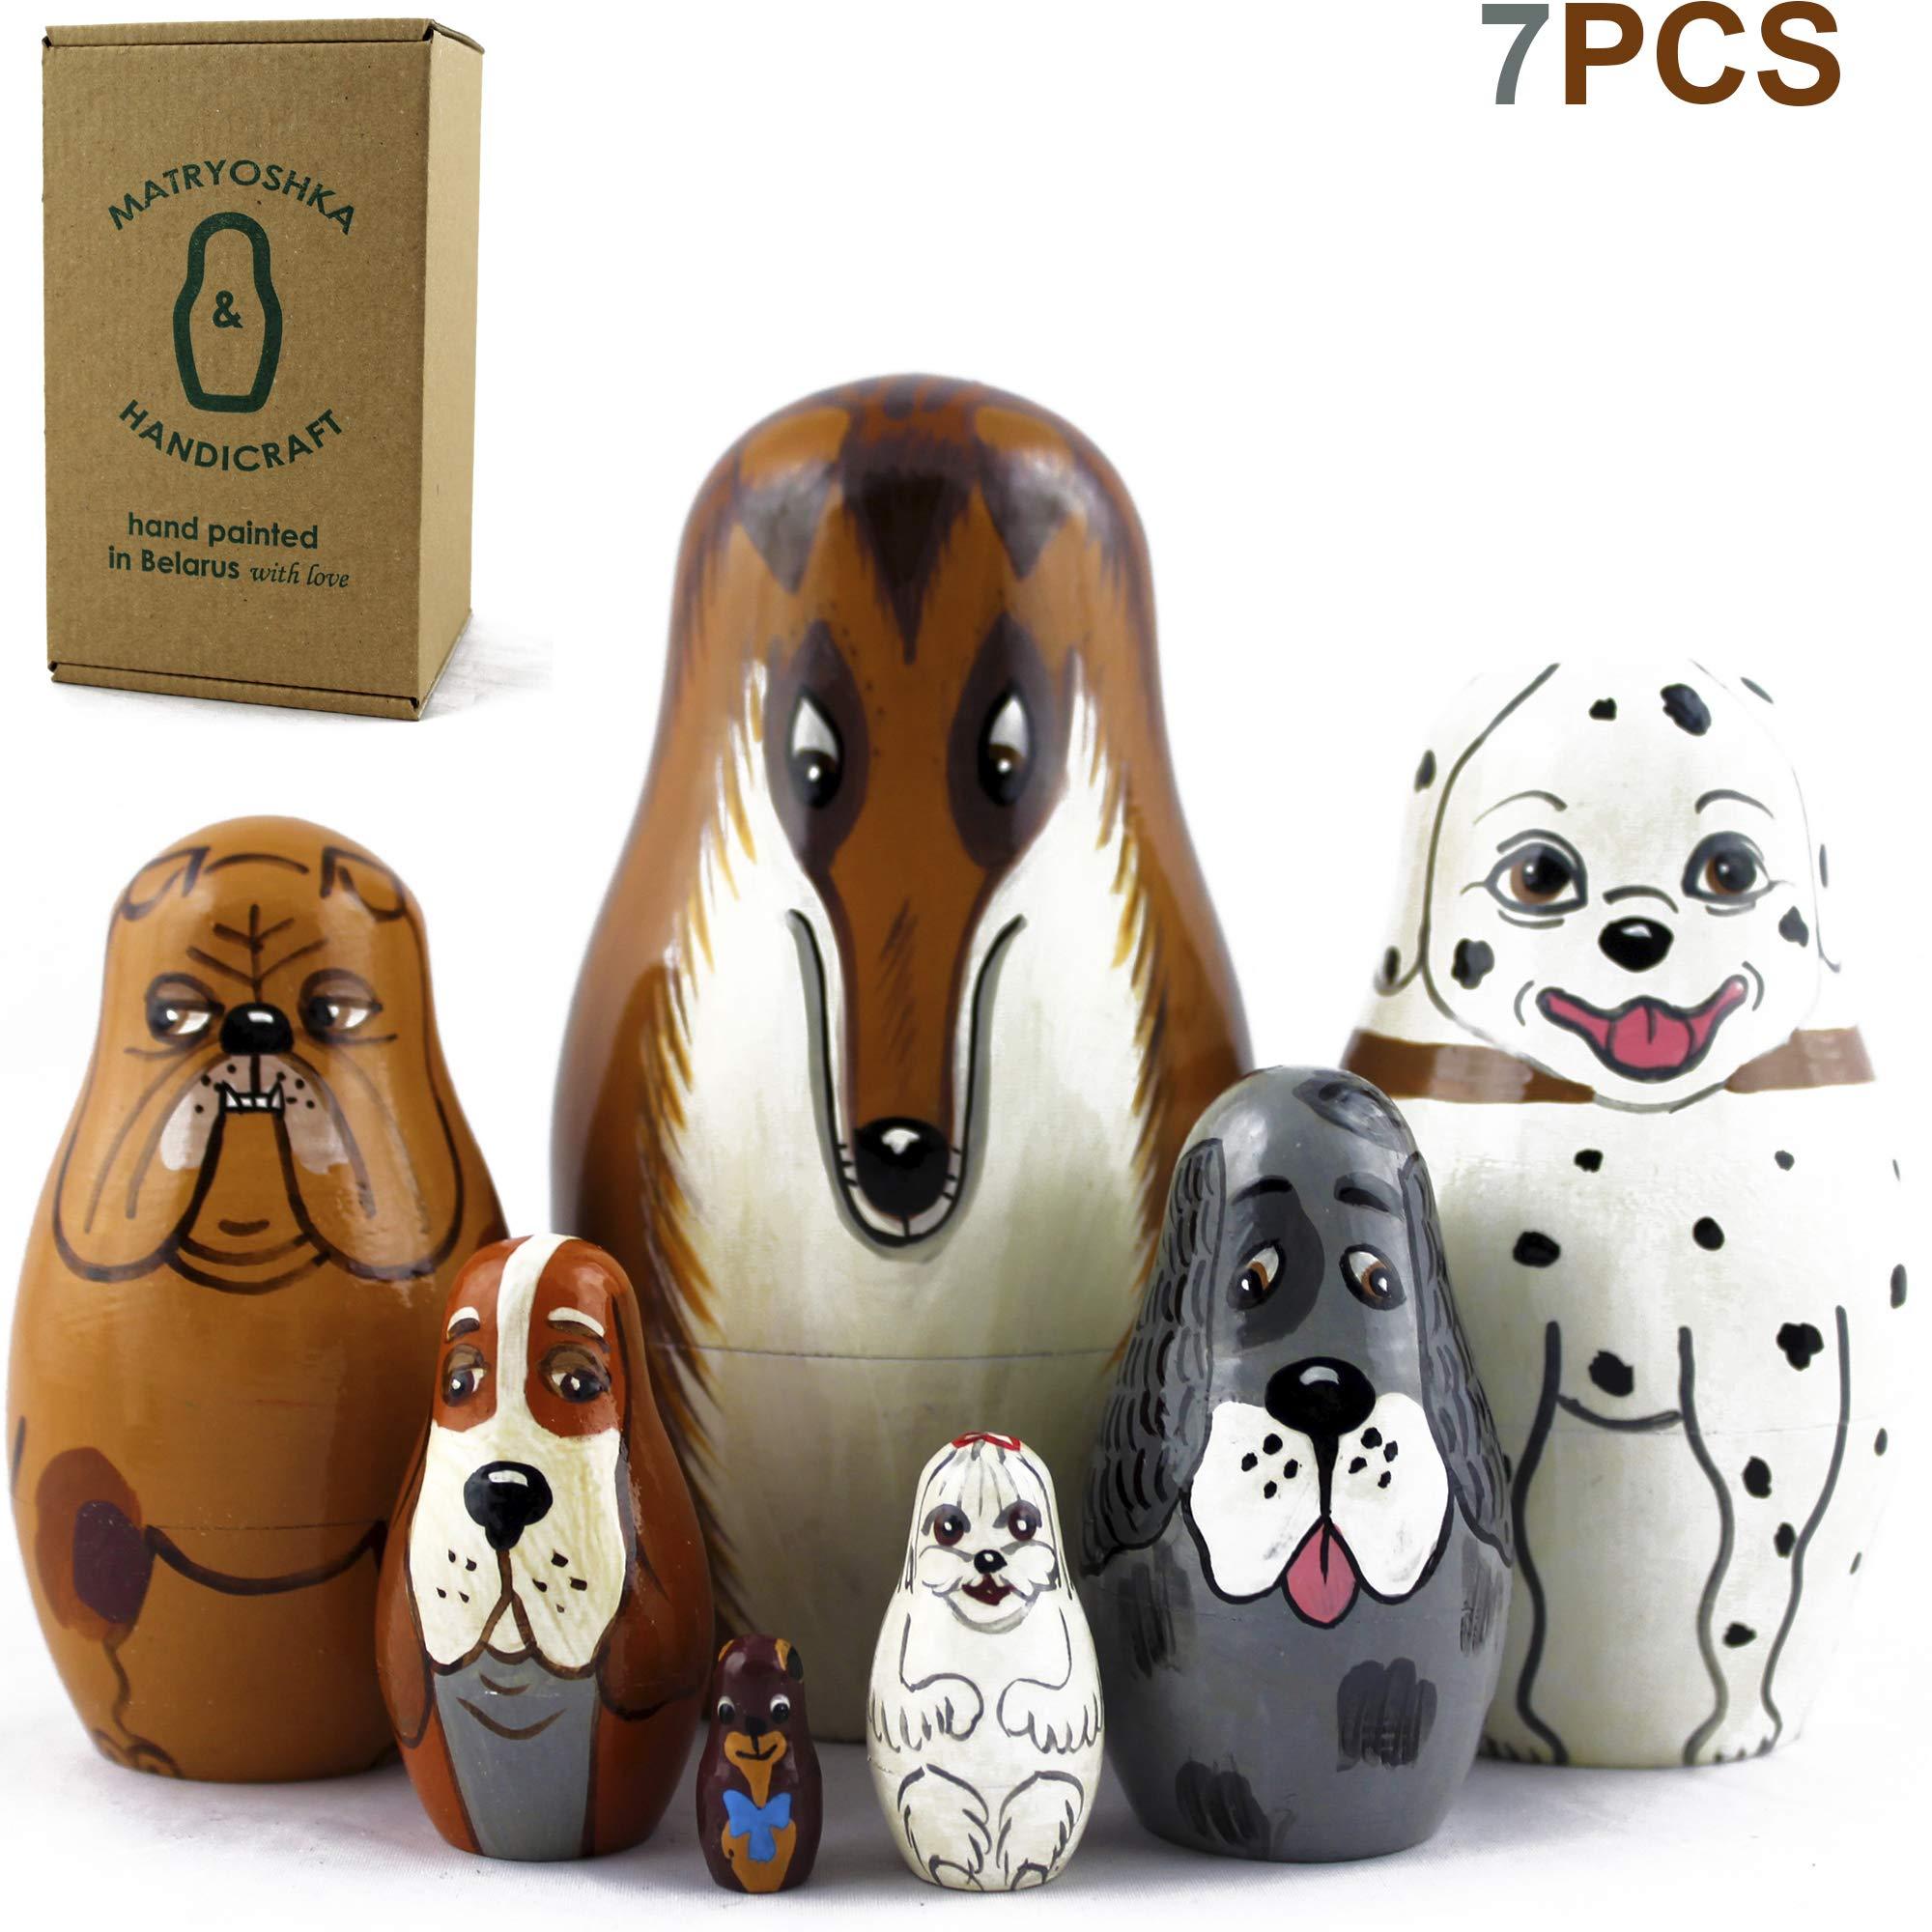 MATRYOSHKA&HANDICRAFT Dog Nesting Dolls - Toy Dog Lover Gifts - 7 Dog Figurines - Dog Kids Figure Doll by MATRYOSHKA&HANDICRAFT